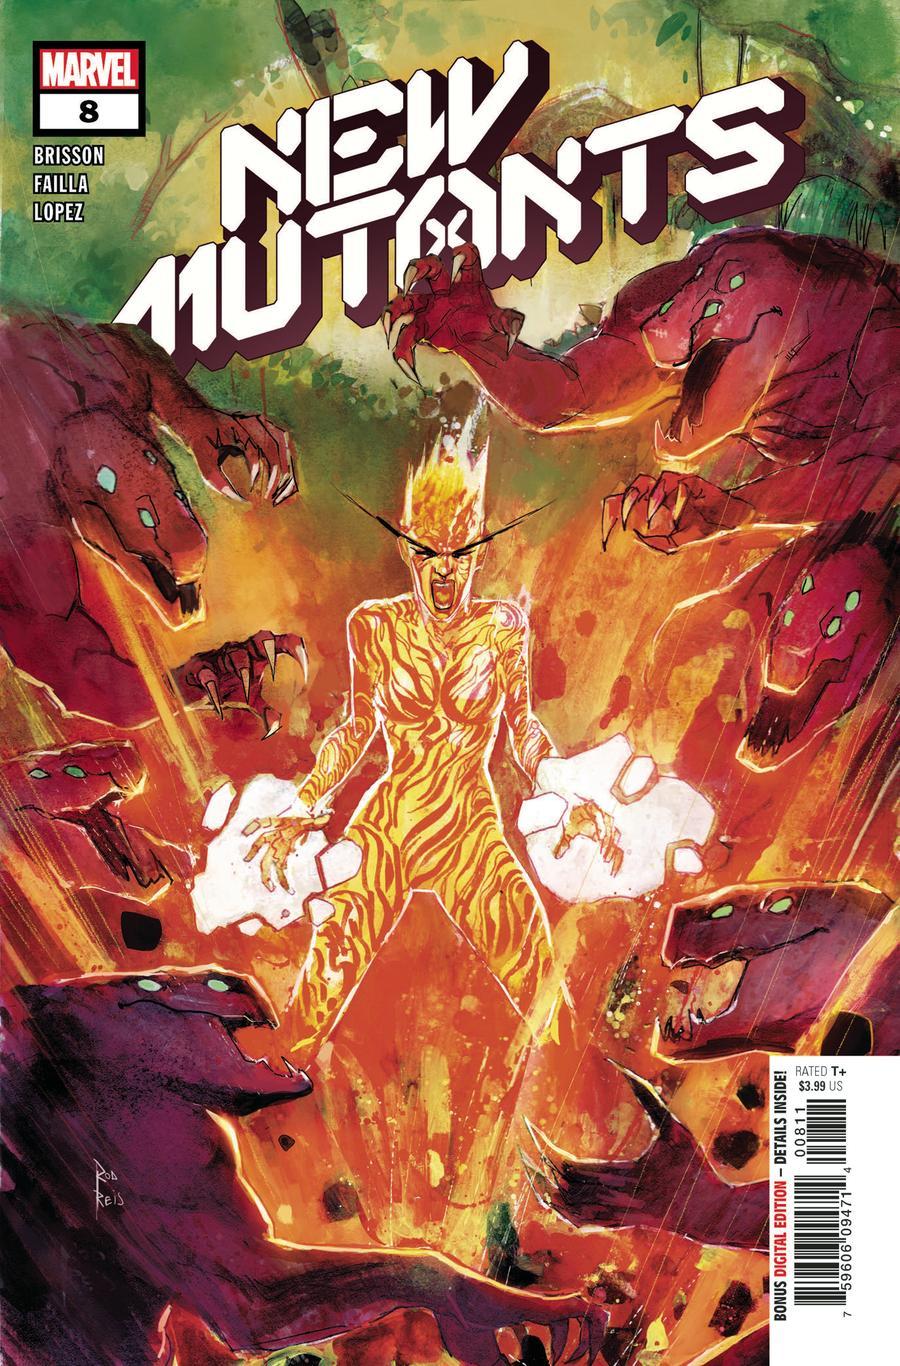 New Mutants Vol 4 #8 (Dawn Of X Tie-In)